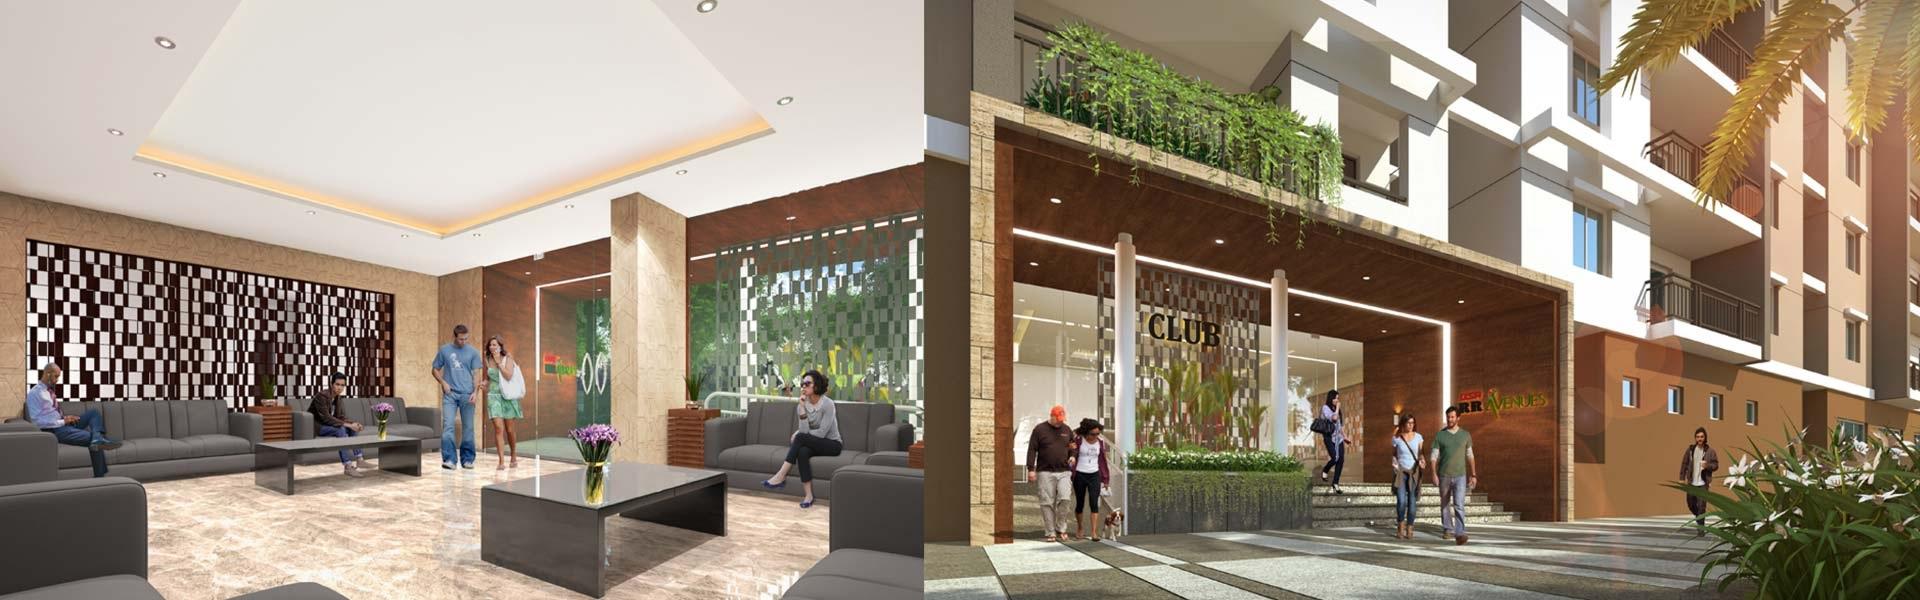 dsr rr avenues amenities features3